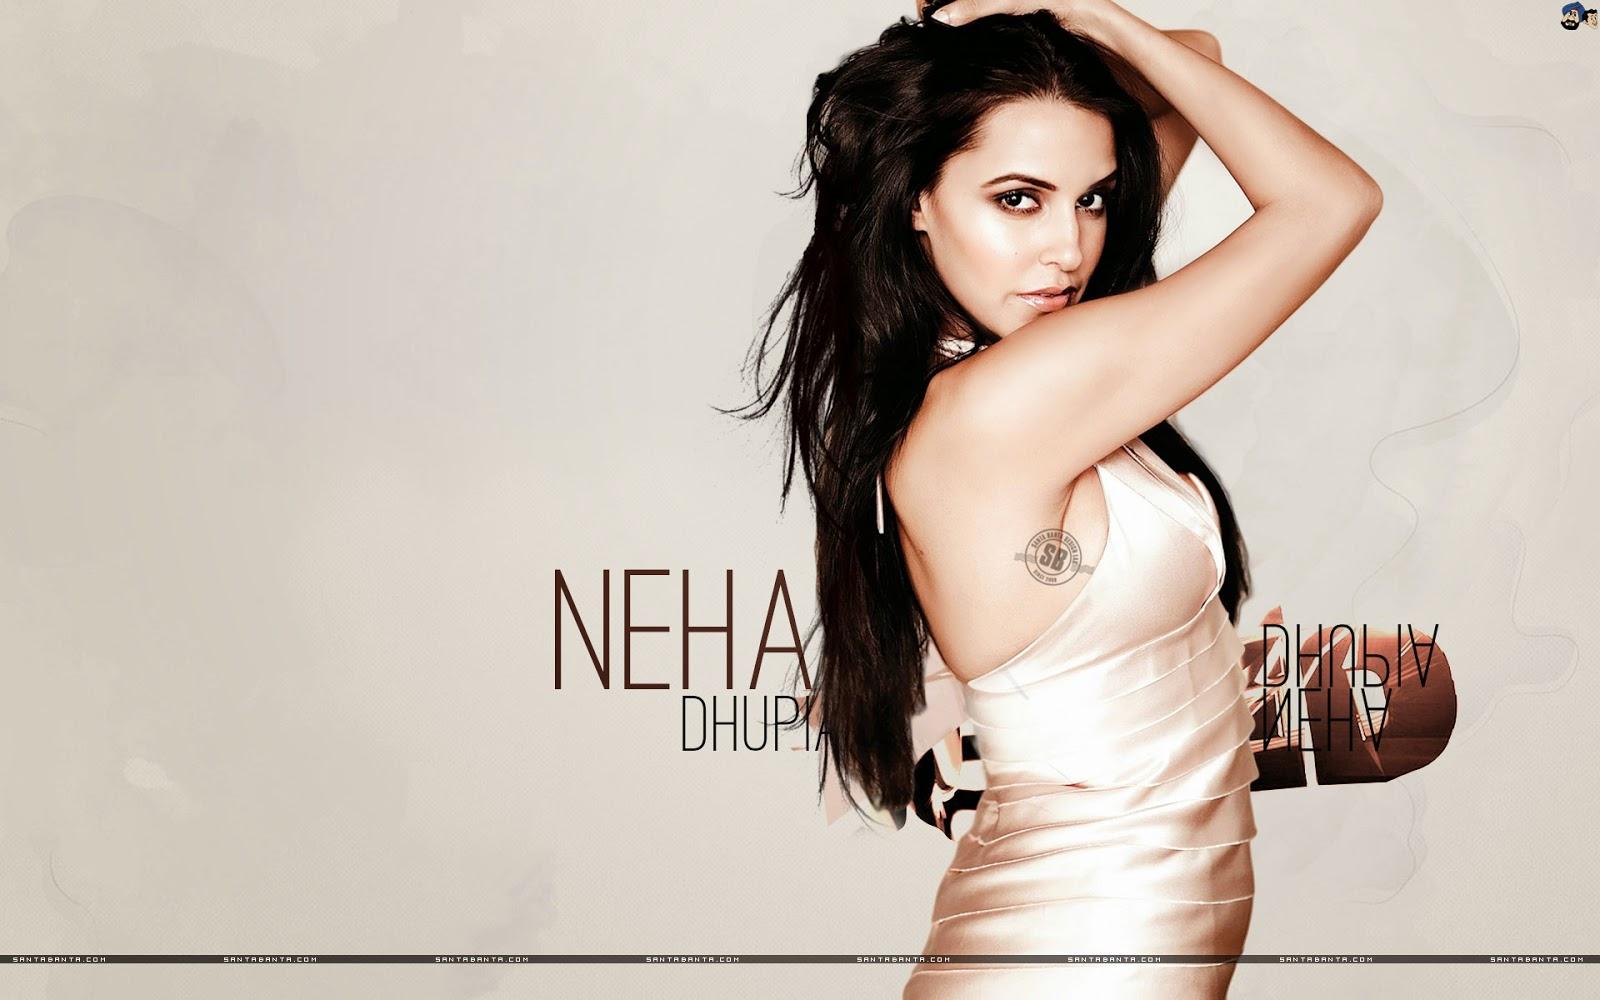 Koleksi Foto Neha Dhupia 17